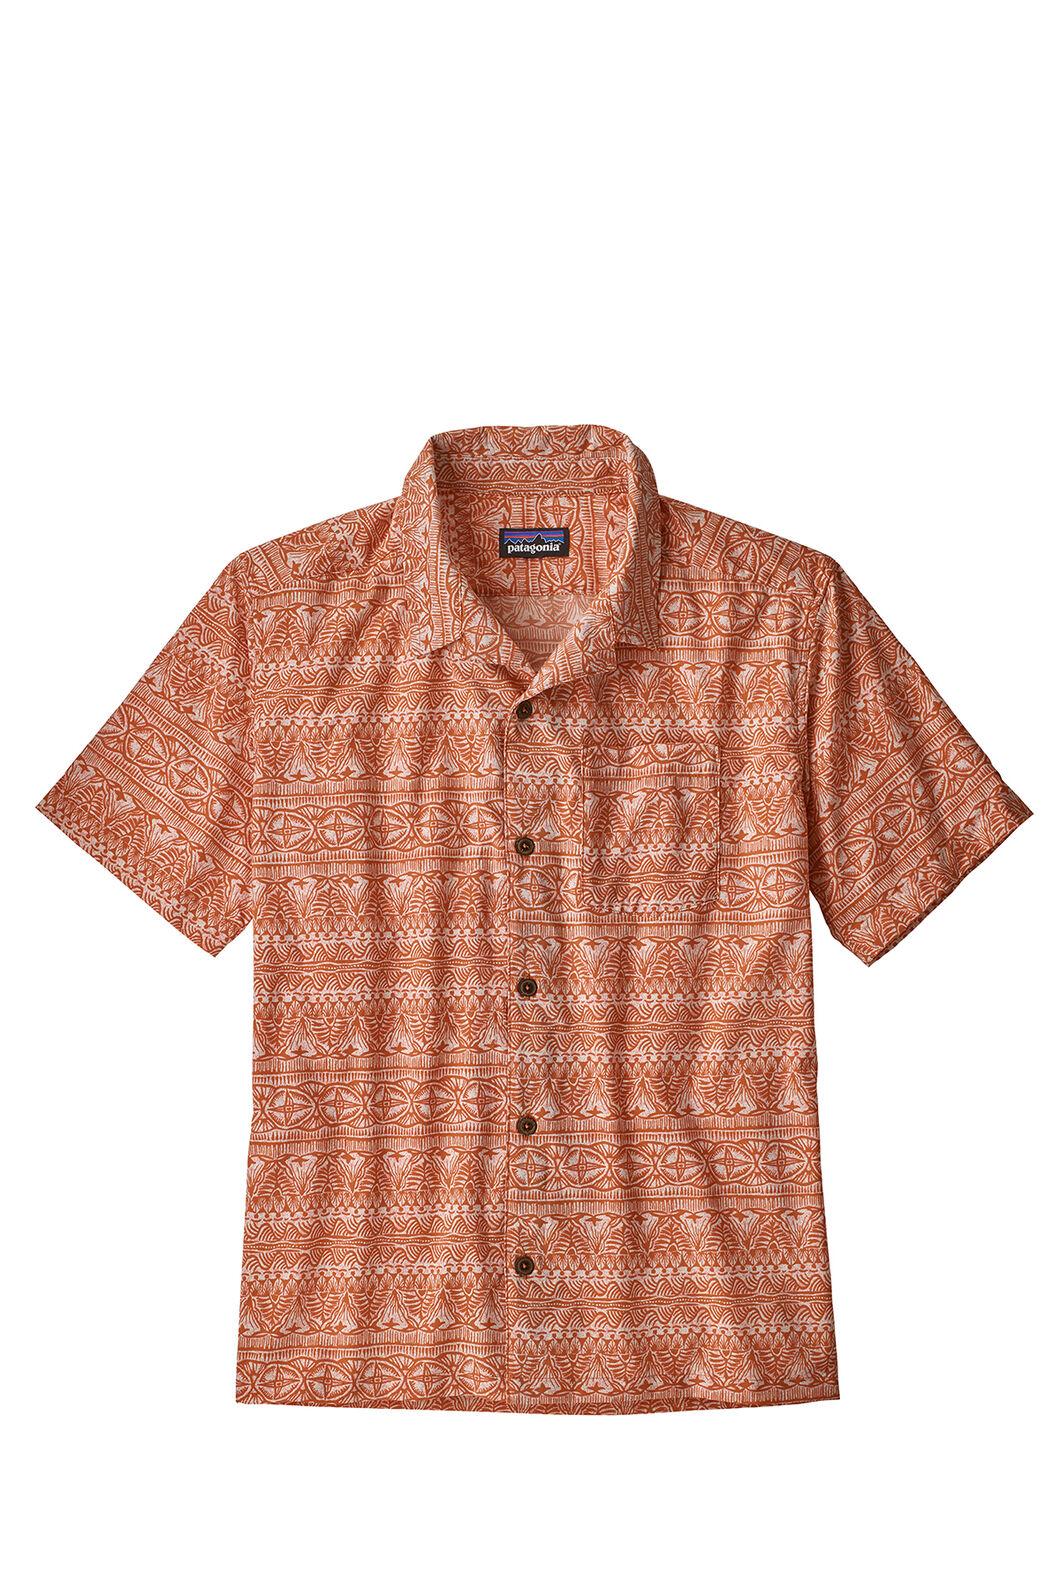 Patagonia Stretch Planing Hybrid Shirt — Men's, Tradewinds small/sunsetorange, hi-res